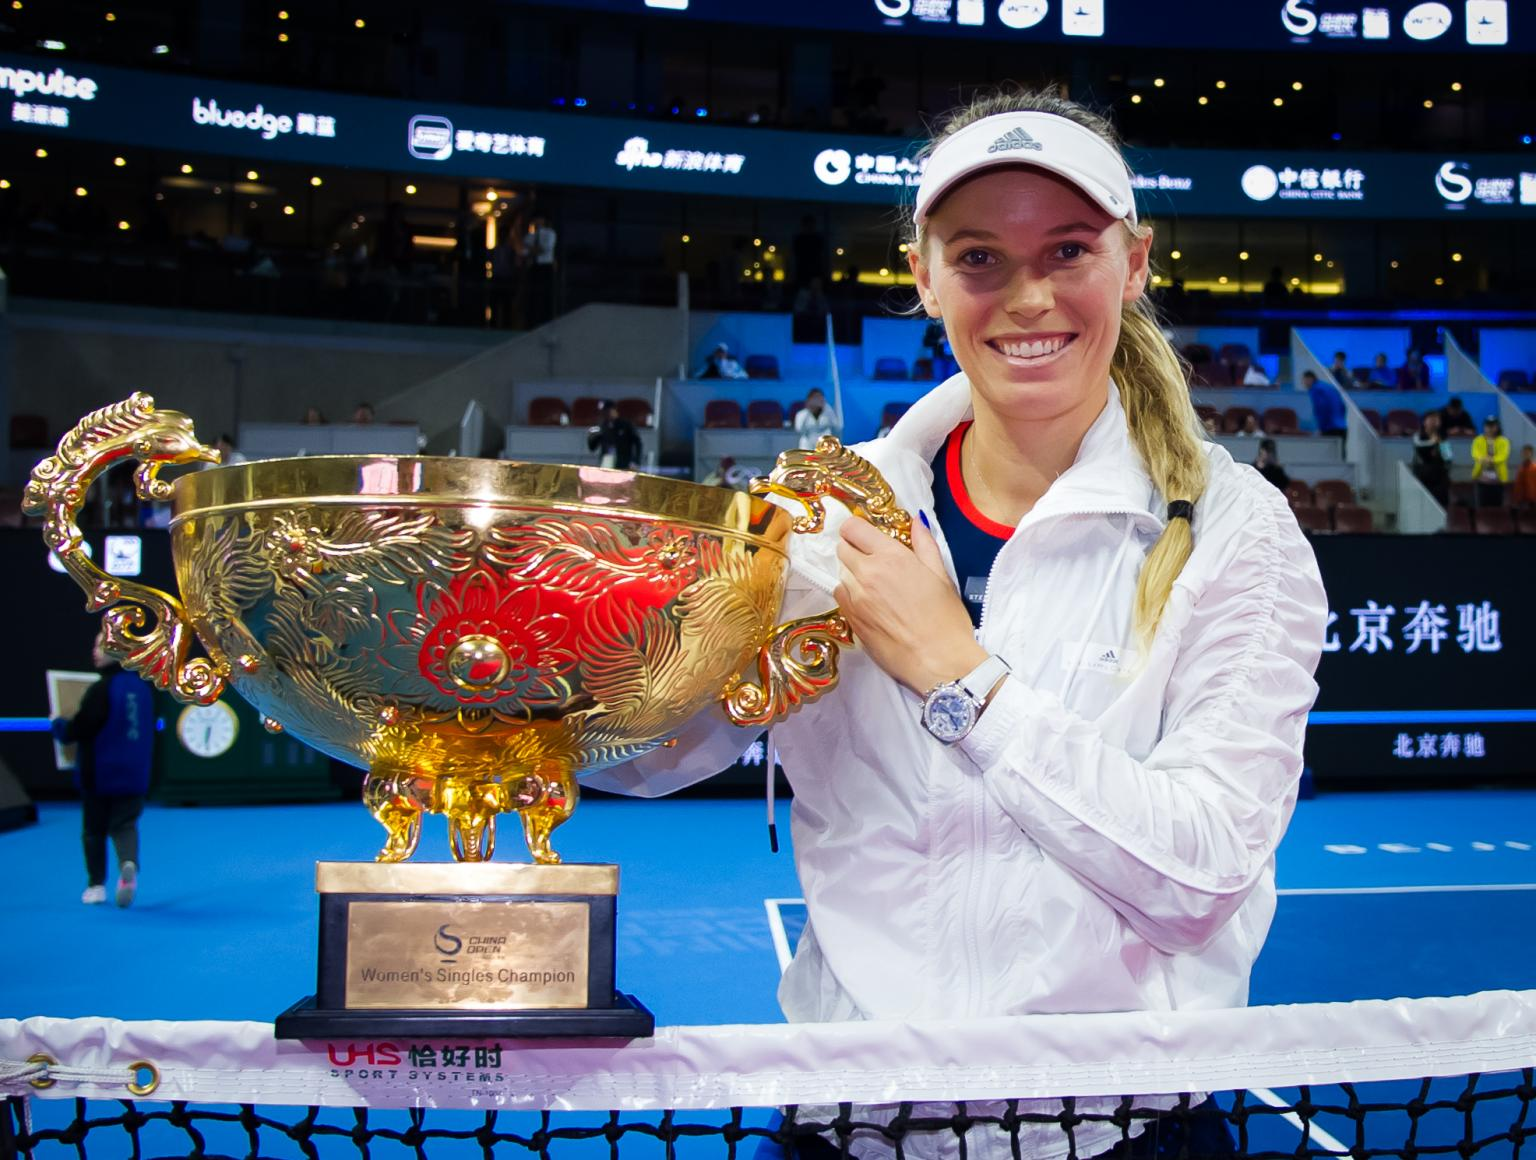 Wozniacki defeats Sevastova  to wear Beijing crown in China Open